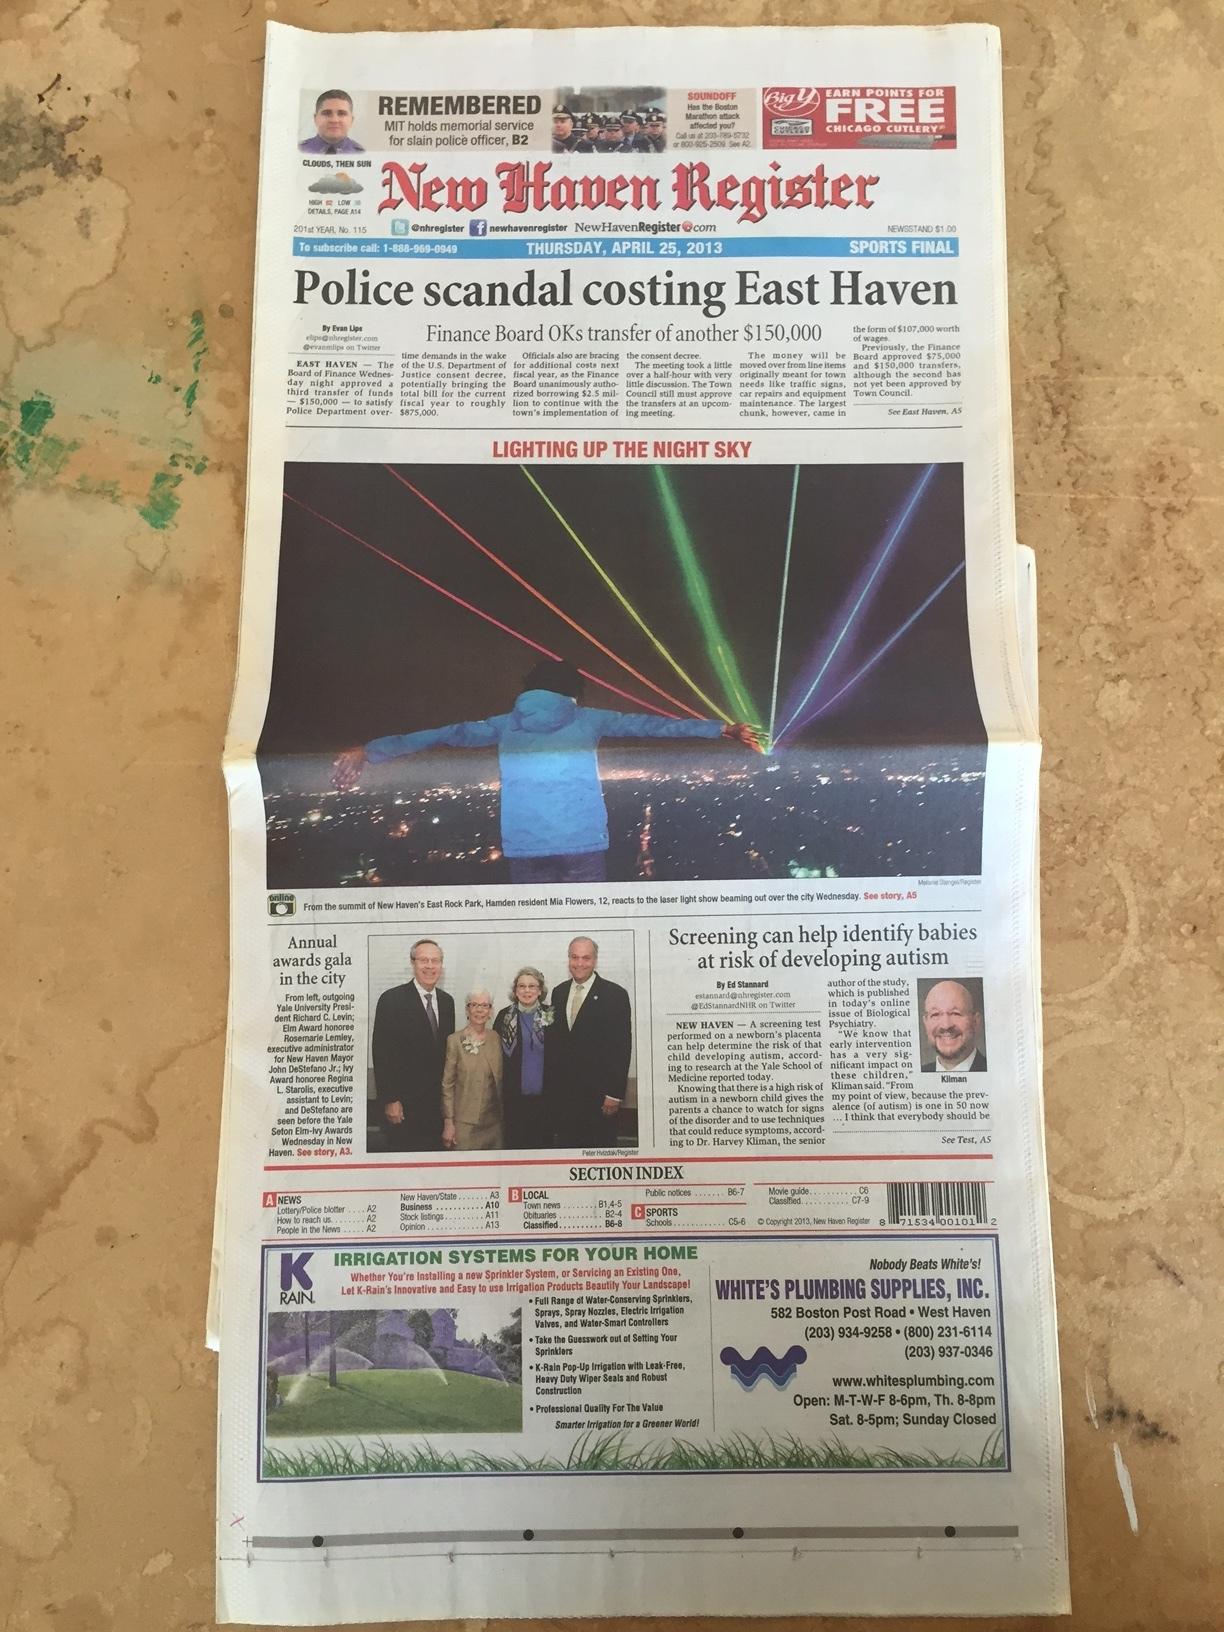 New Haven Register - April 25, 2013